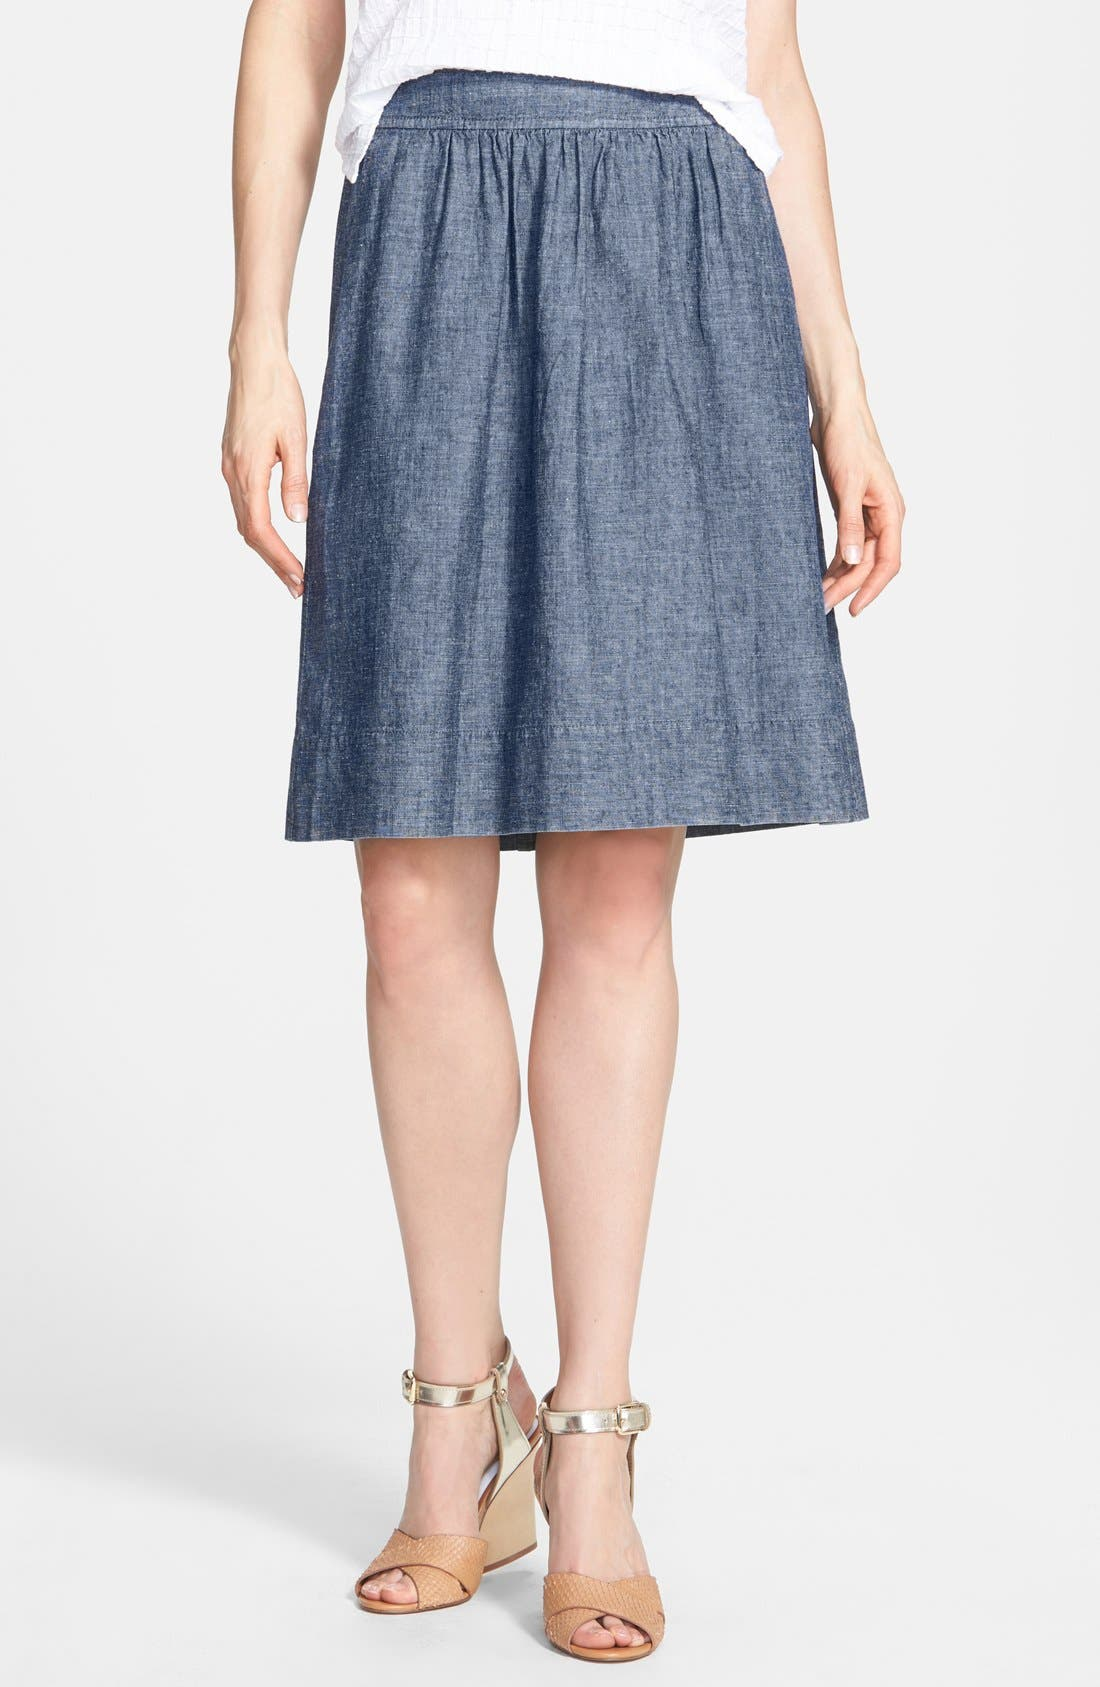 Alternate Image 1 Selected - Eileen Fisher Hemp & Organic Cotton A-Line Skirt (Regular & Petite)